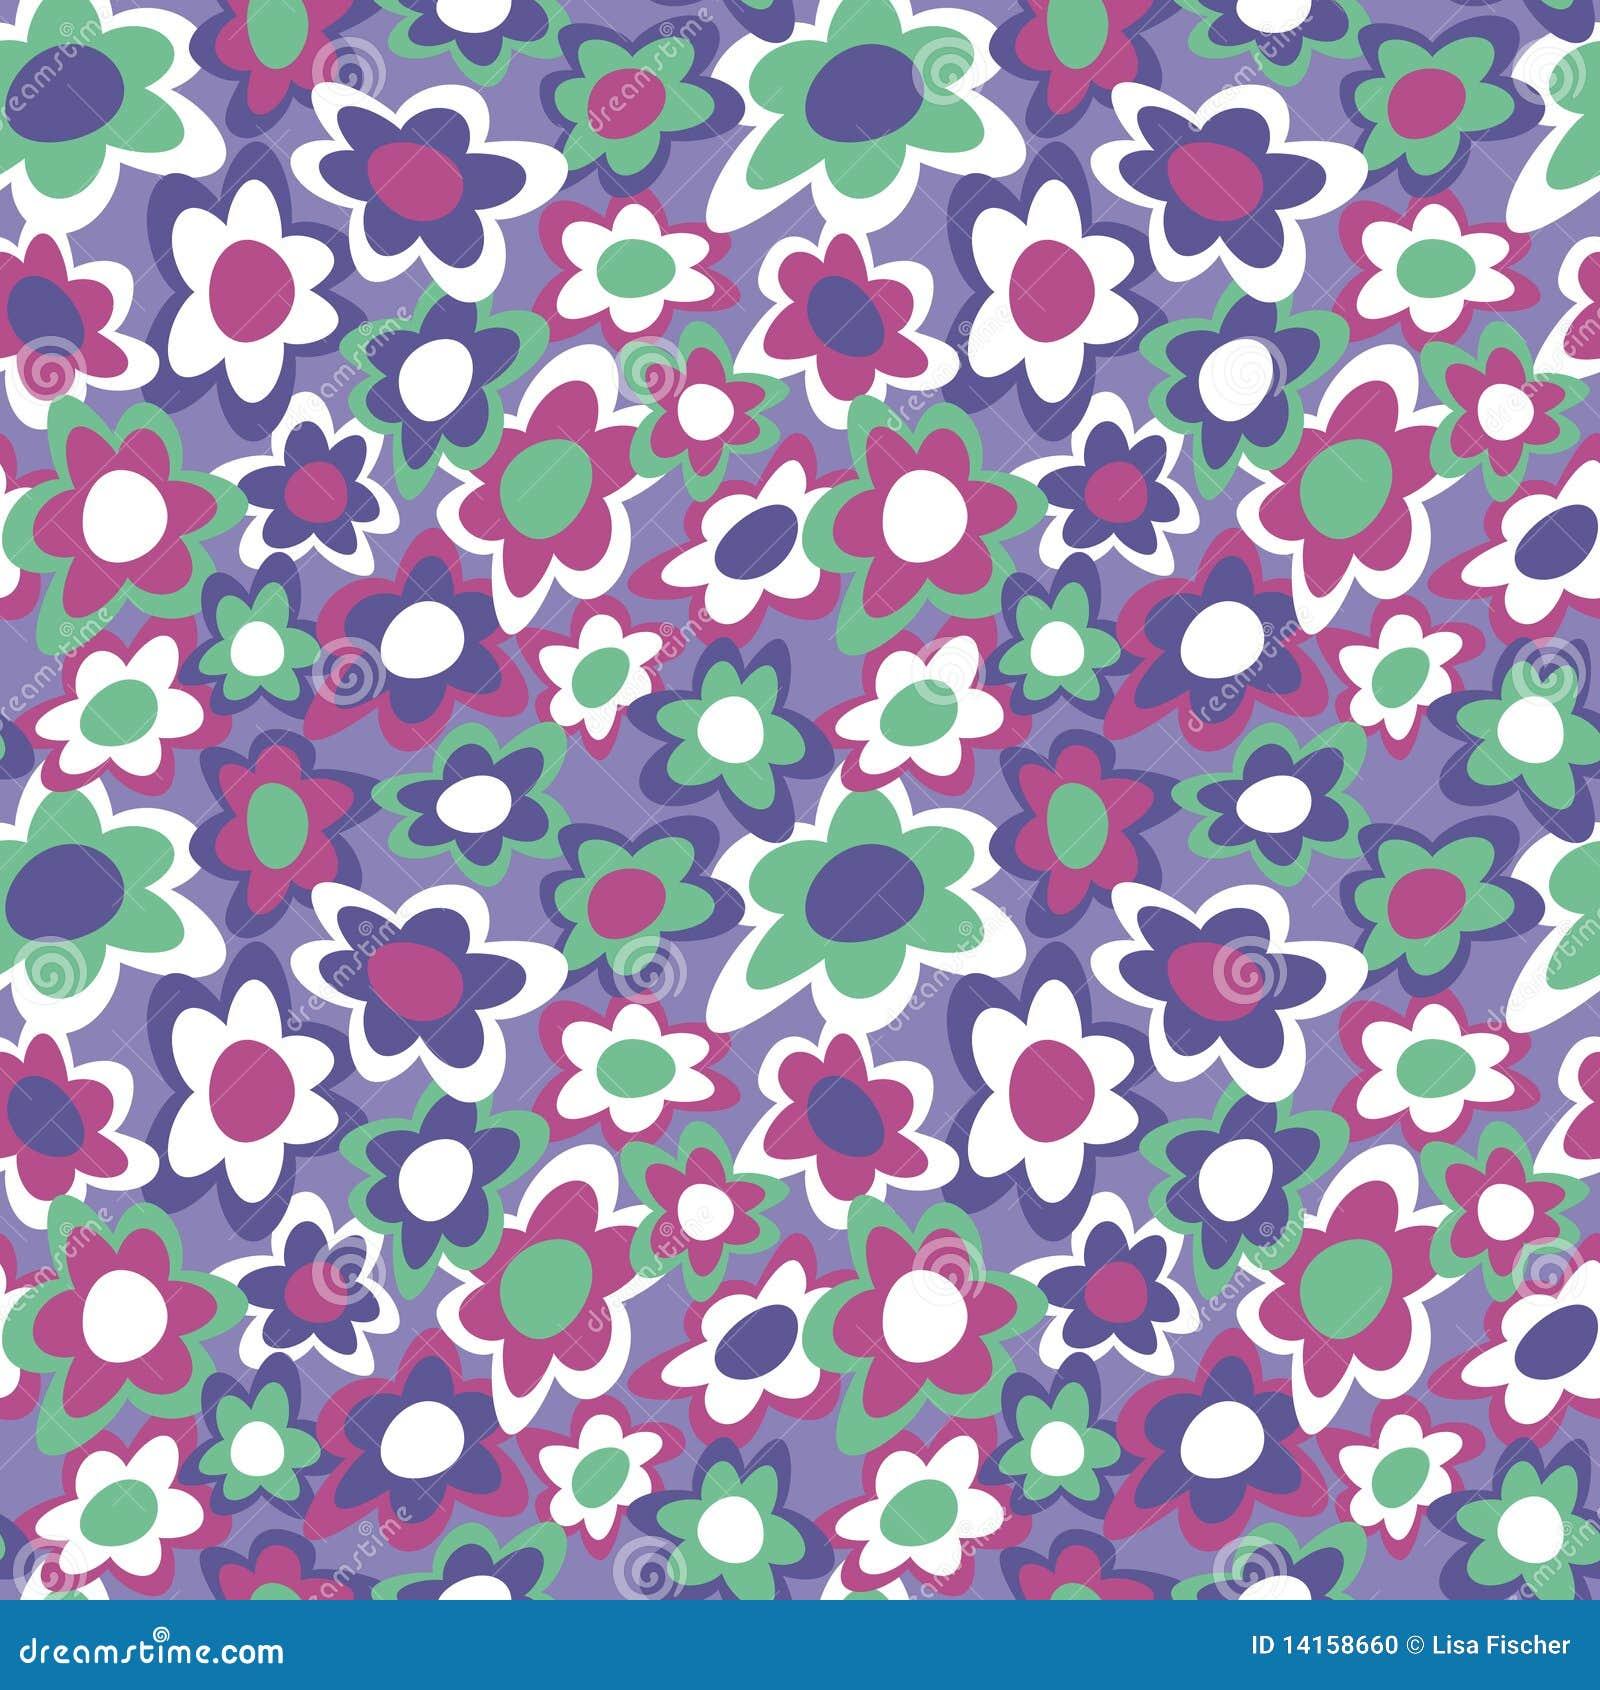 Flowers_Violet cobarde